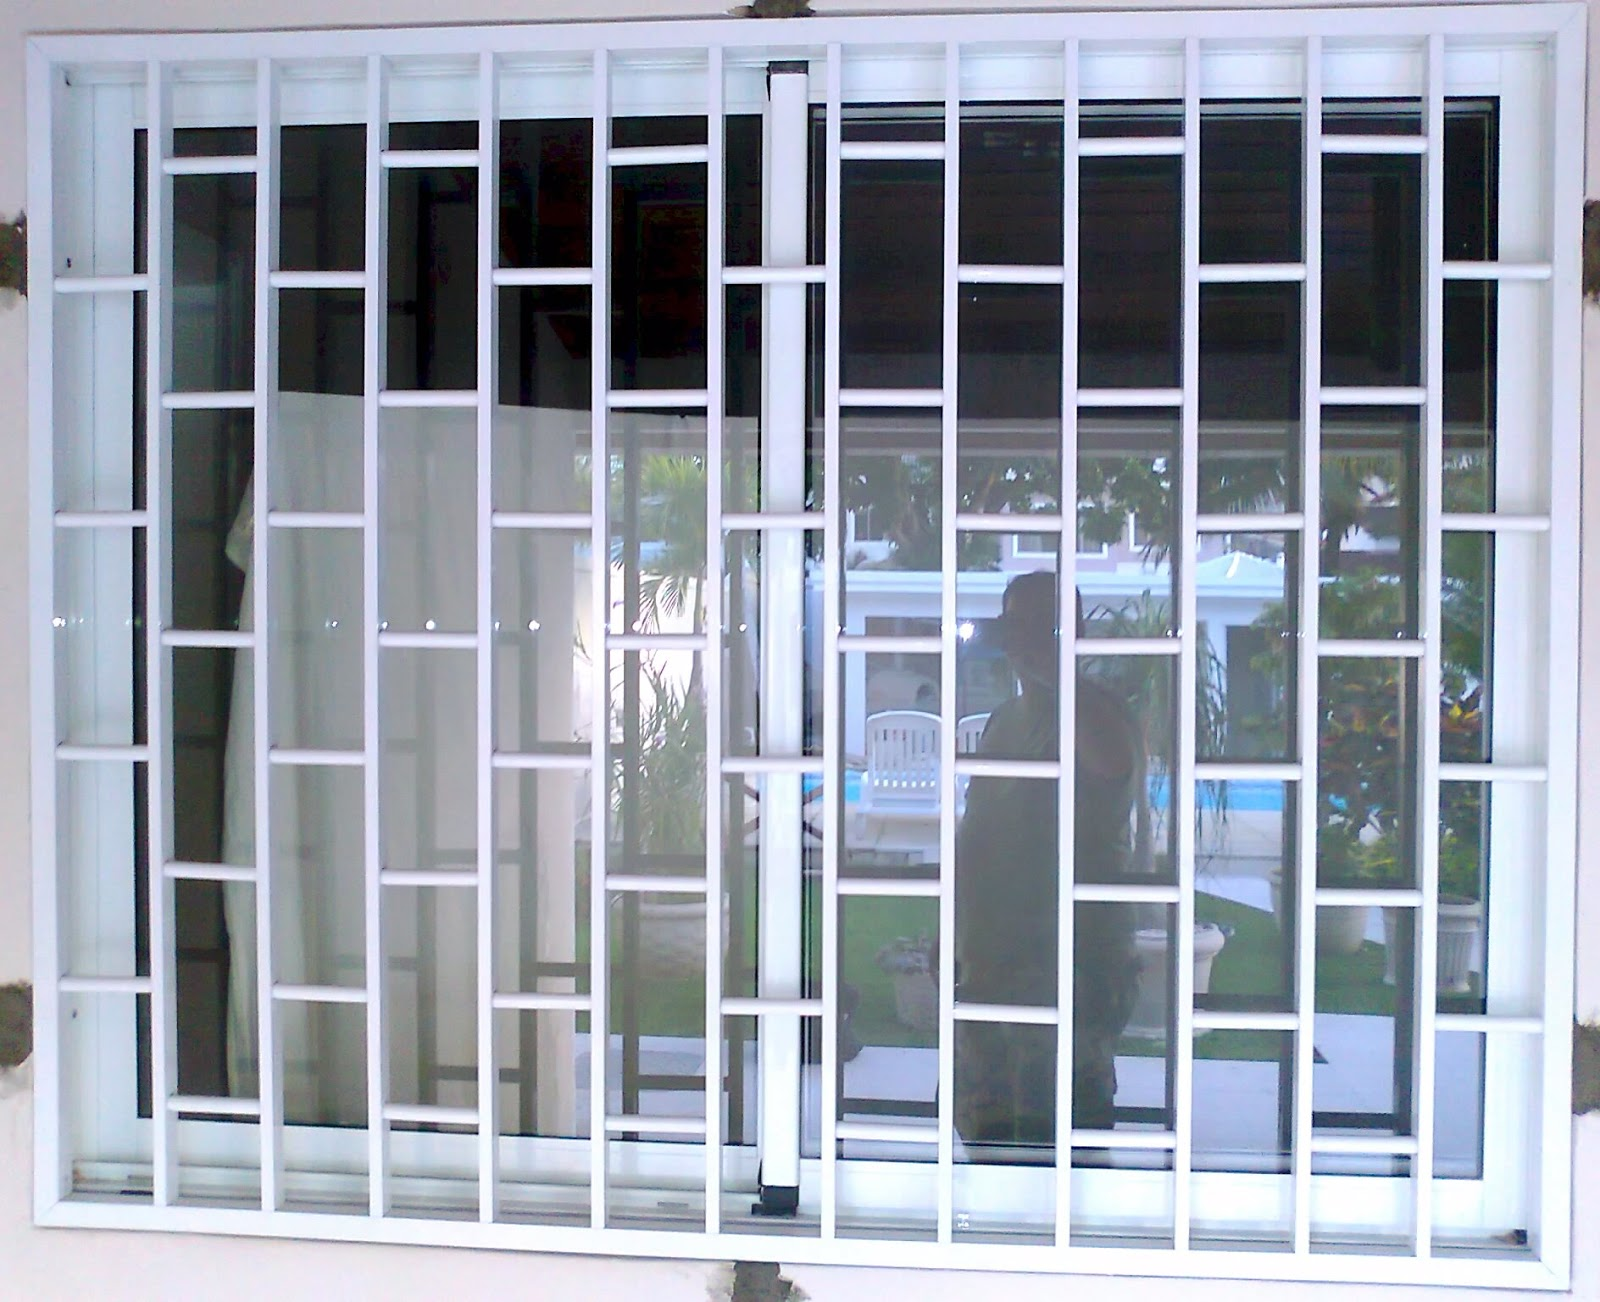 #455486 RS Renato Serralheria: janelas e basculantes de aluminio 620 Janelas Integradas ( Aluminio E Blindex)